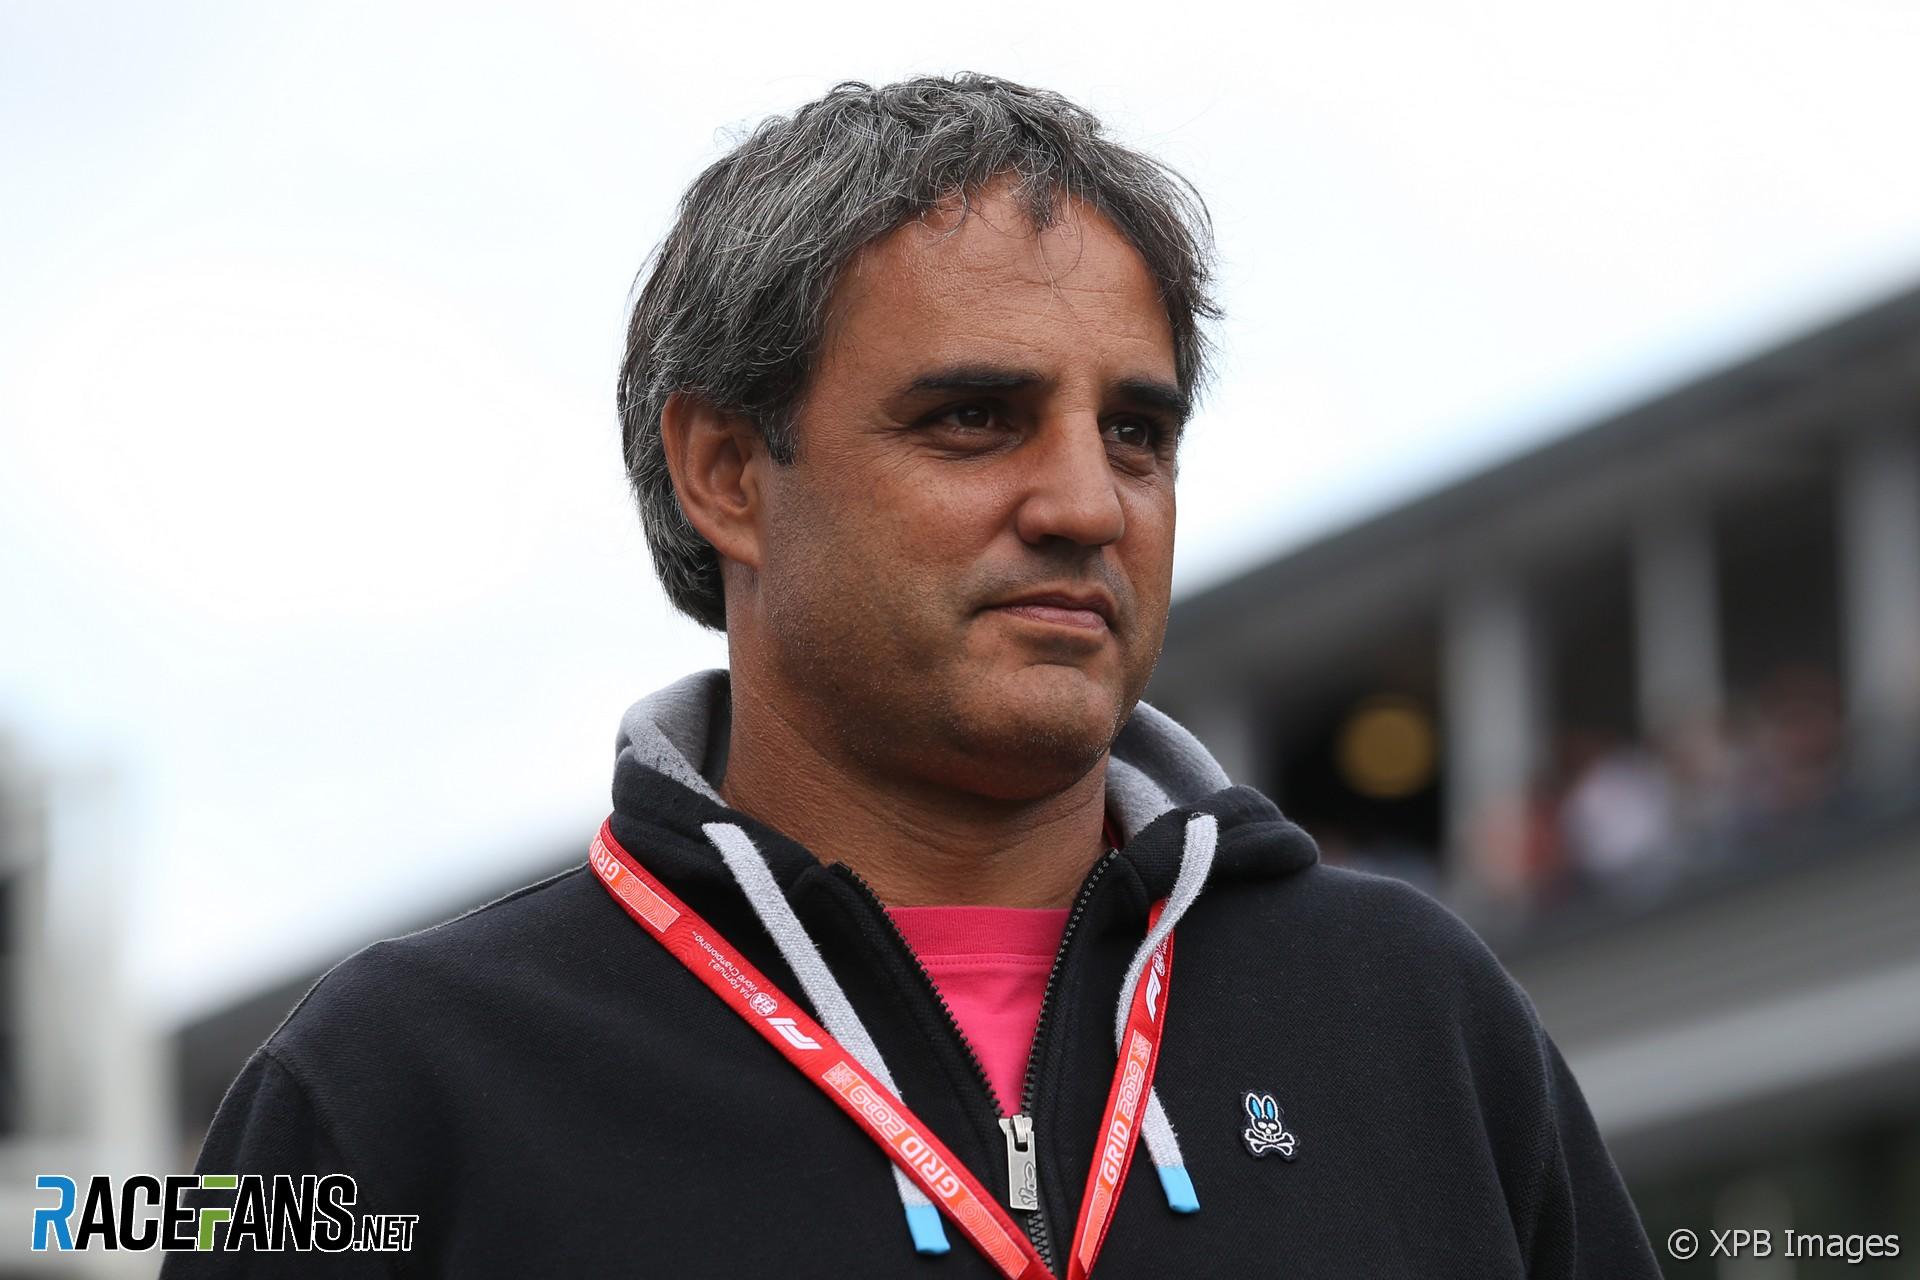 Juan Pablo Montoya, Spa-Francorchamps, 2019